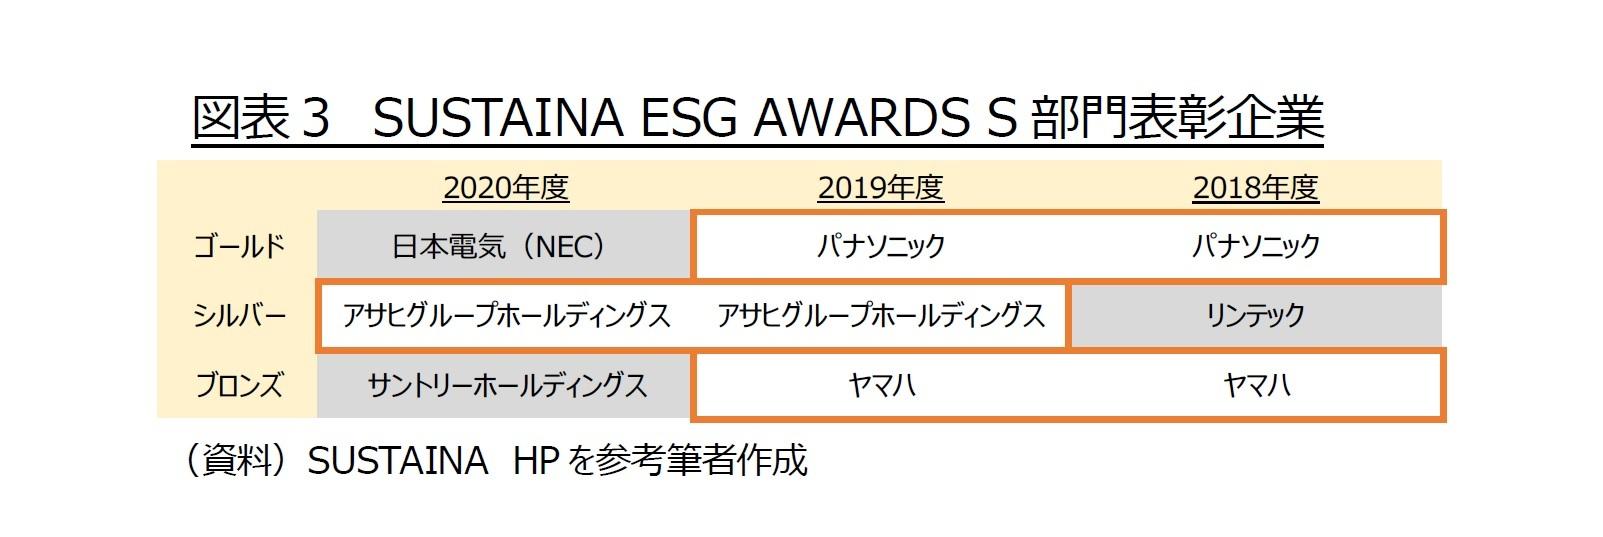 図表3 SUSTAINA ESG AWARDS S部門表彰企業